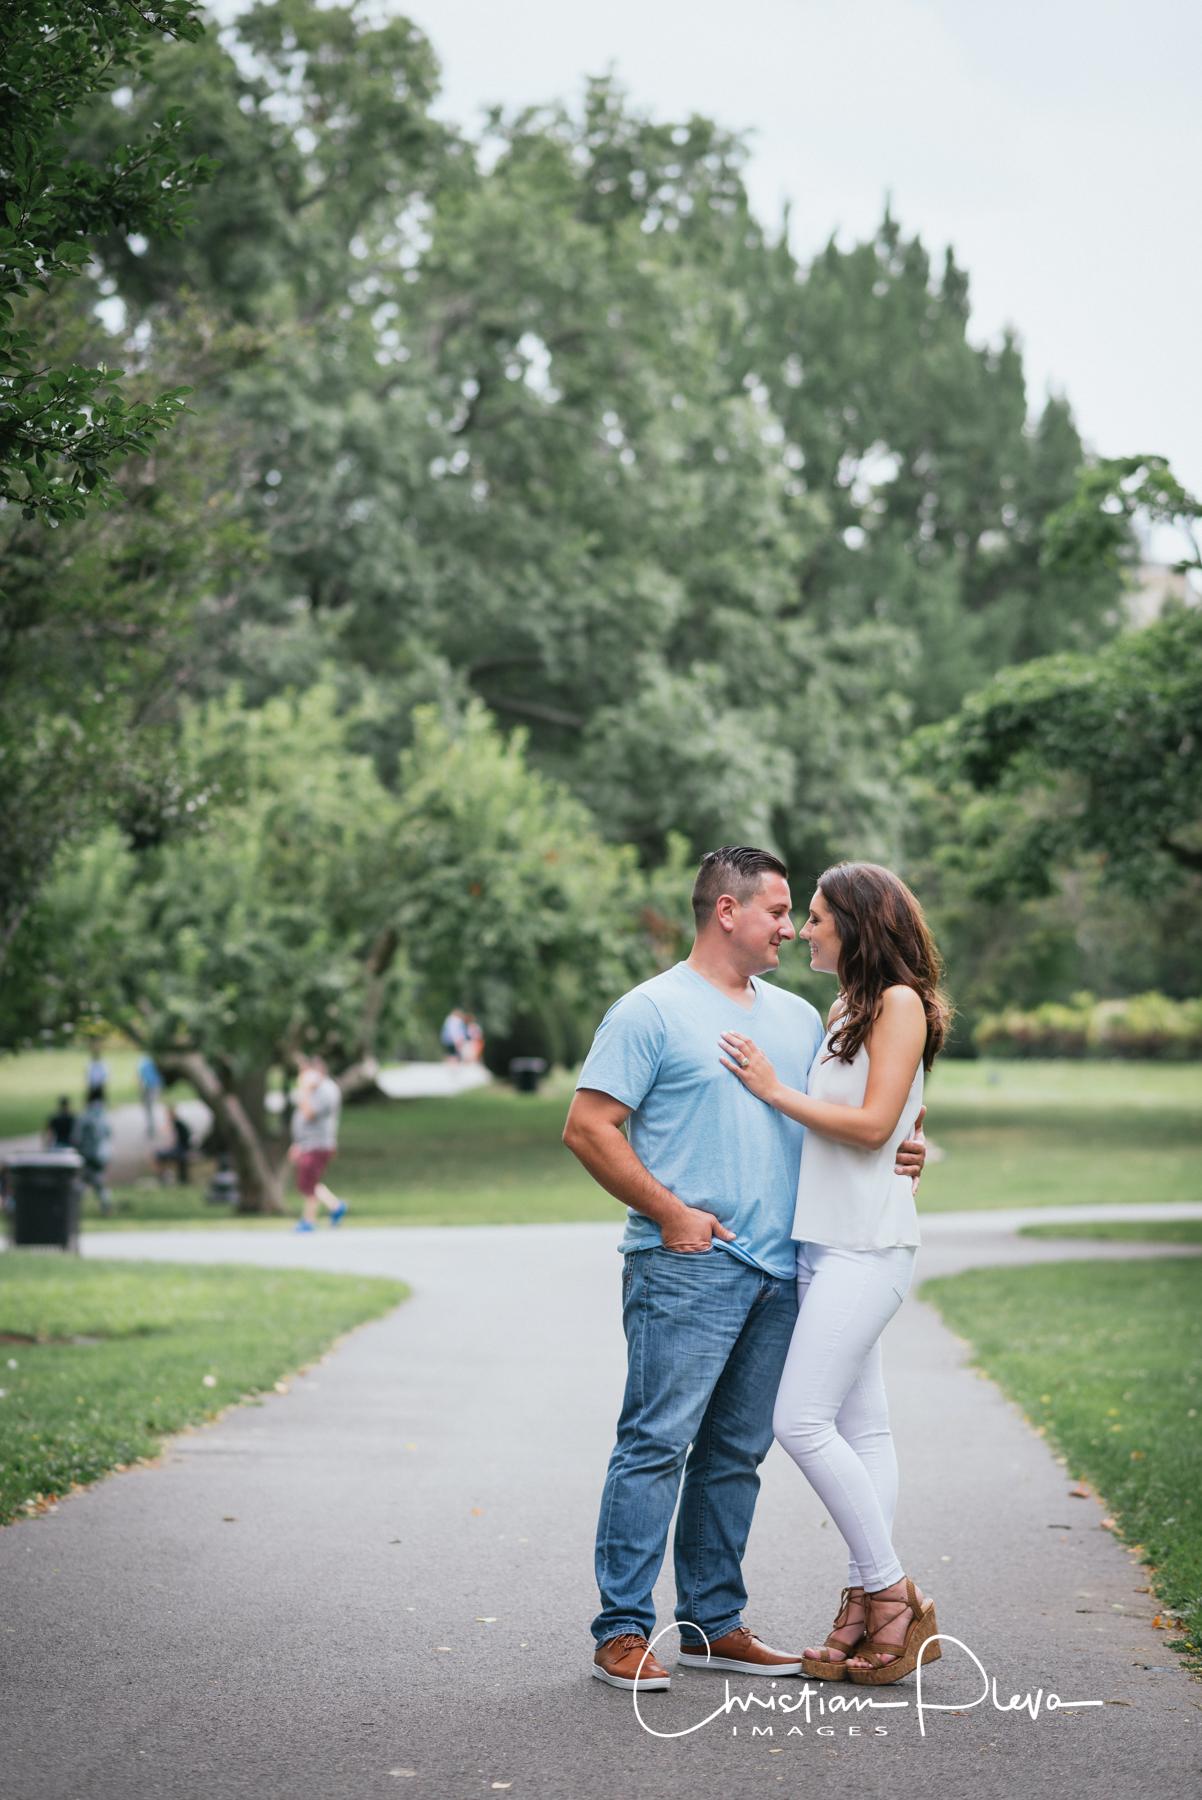 Boston Engagement Photography-3.jpg